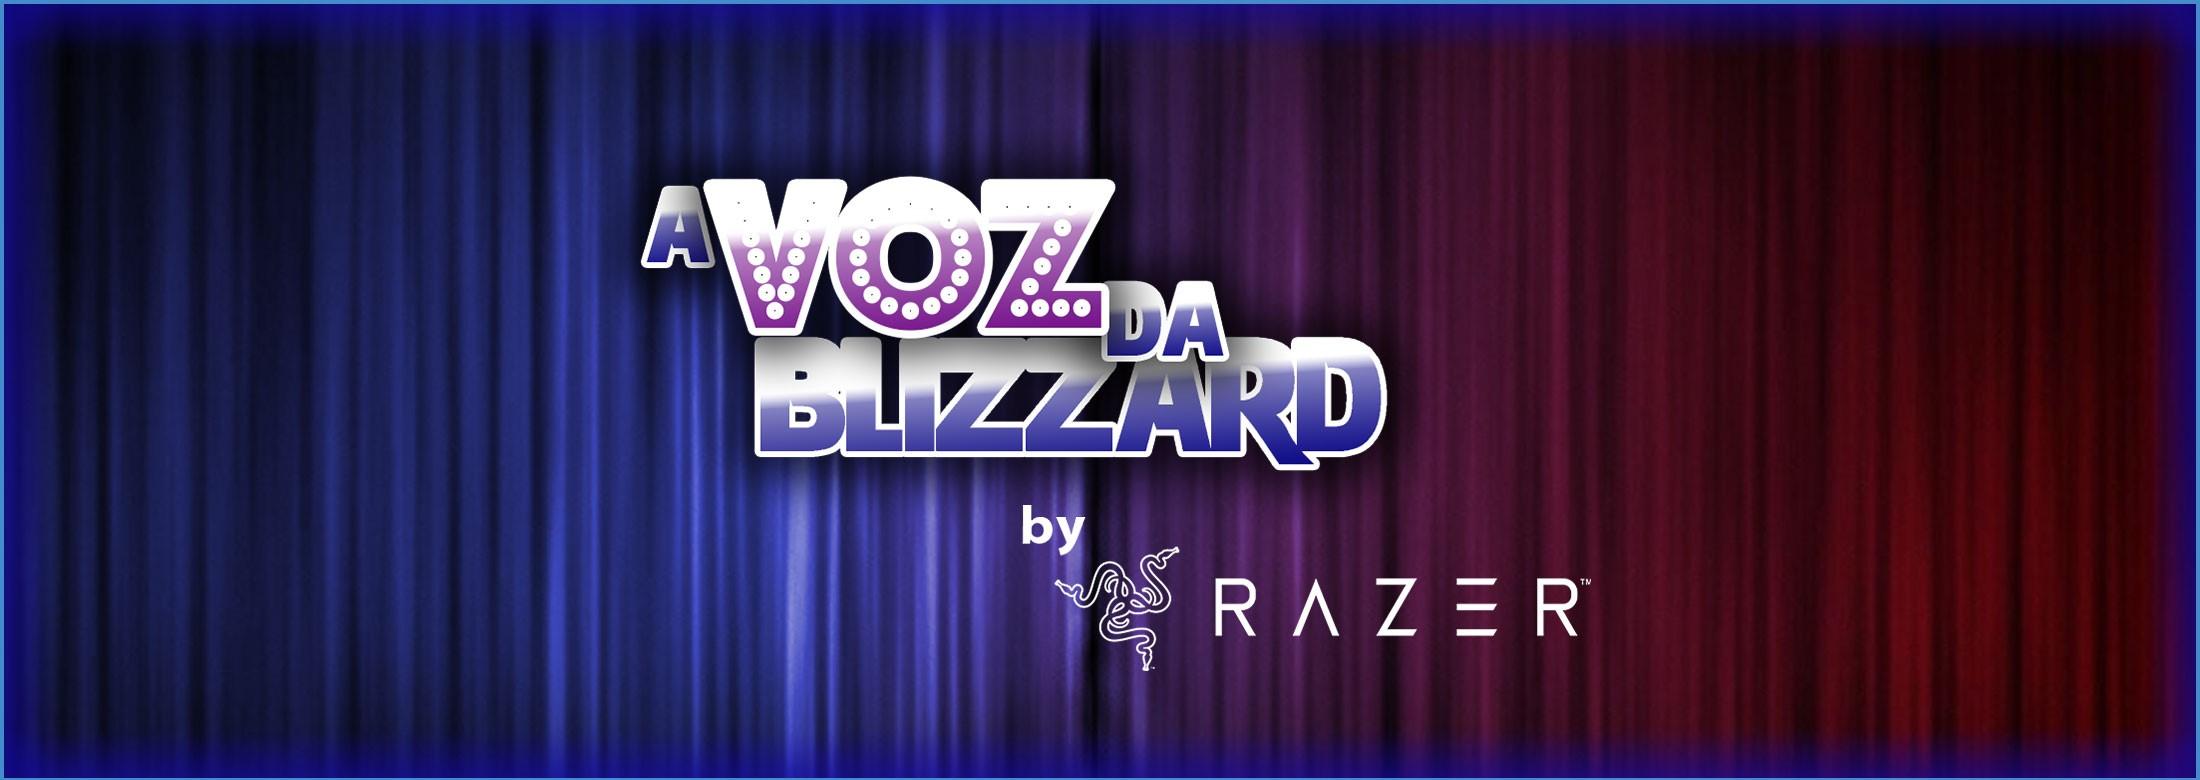 A Voz da Blizzard